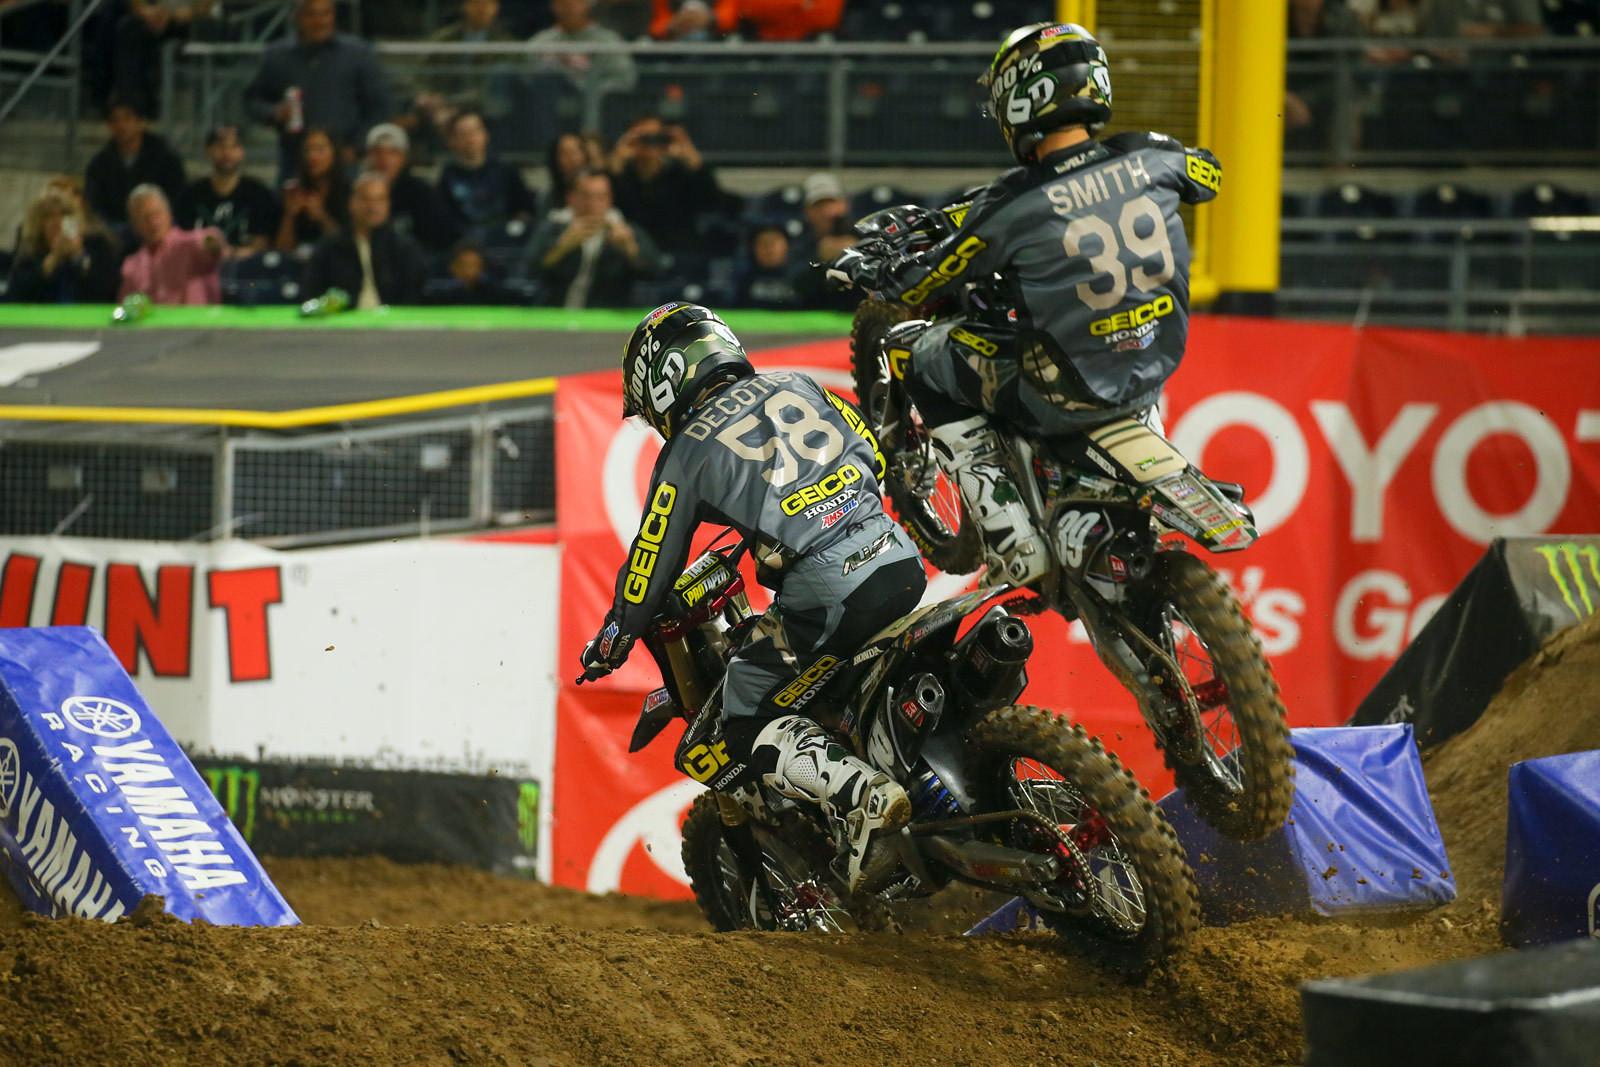 Jimmy DeCotis and Jordon Smith - Photo Blast: San Diego 2 - Motocross Pictures - Vital MX